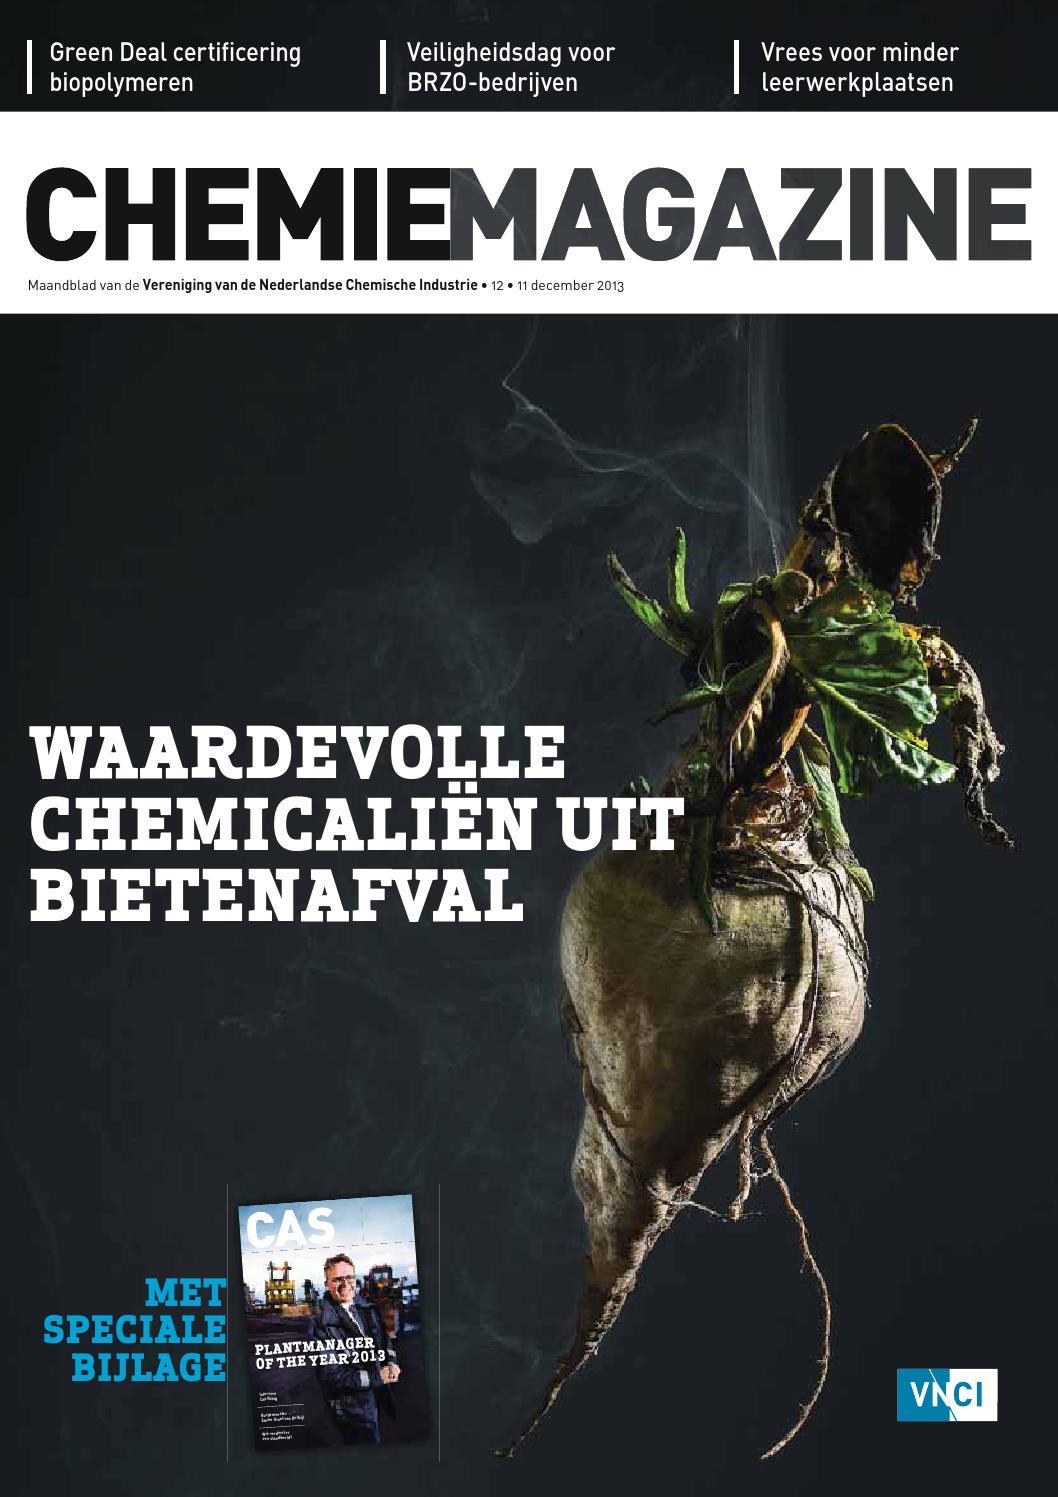 Chemie magazine december 2013 by vnci   issuu